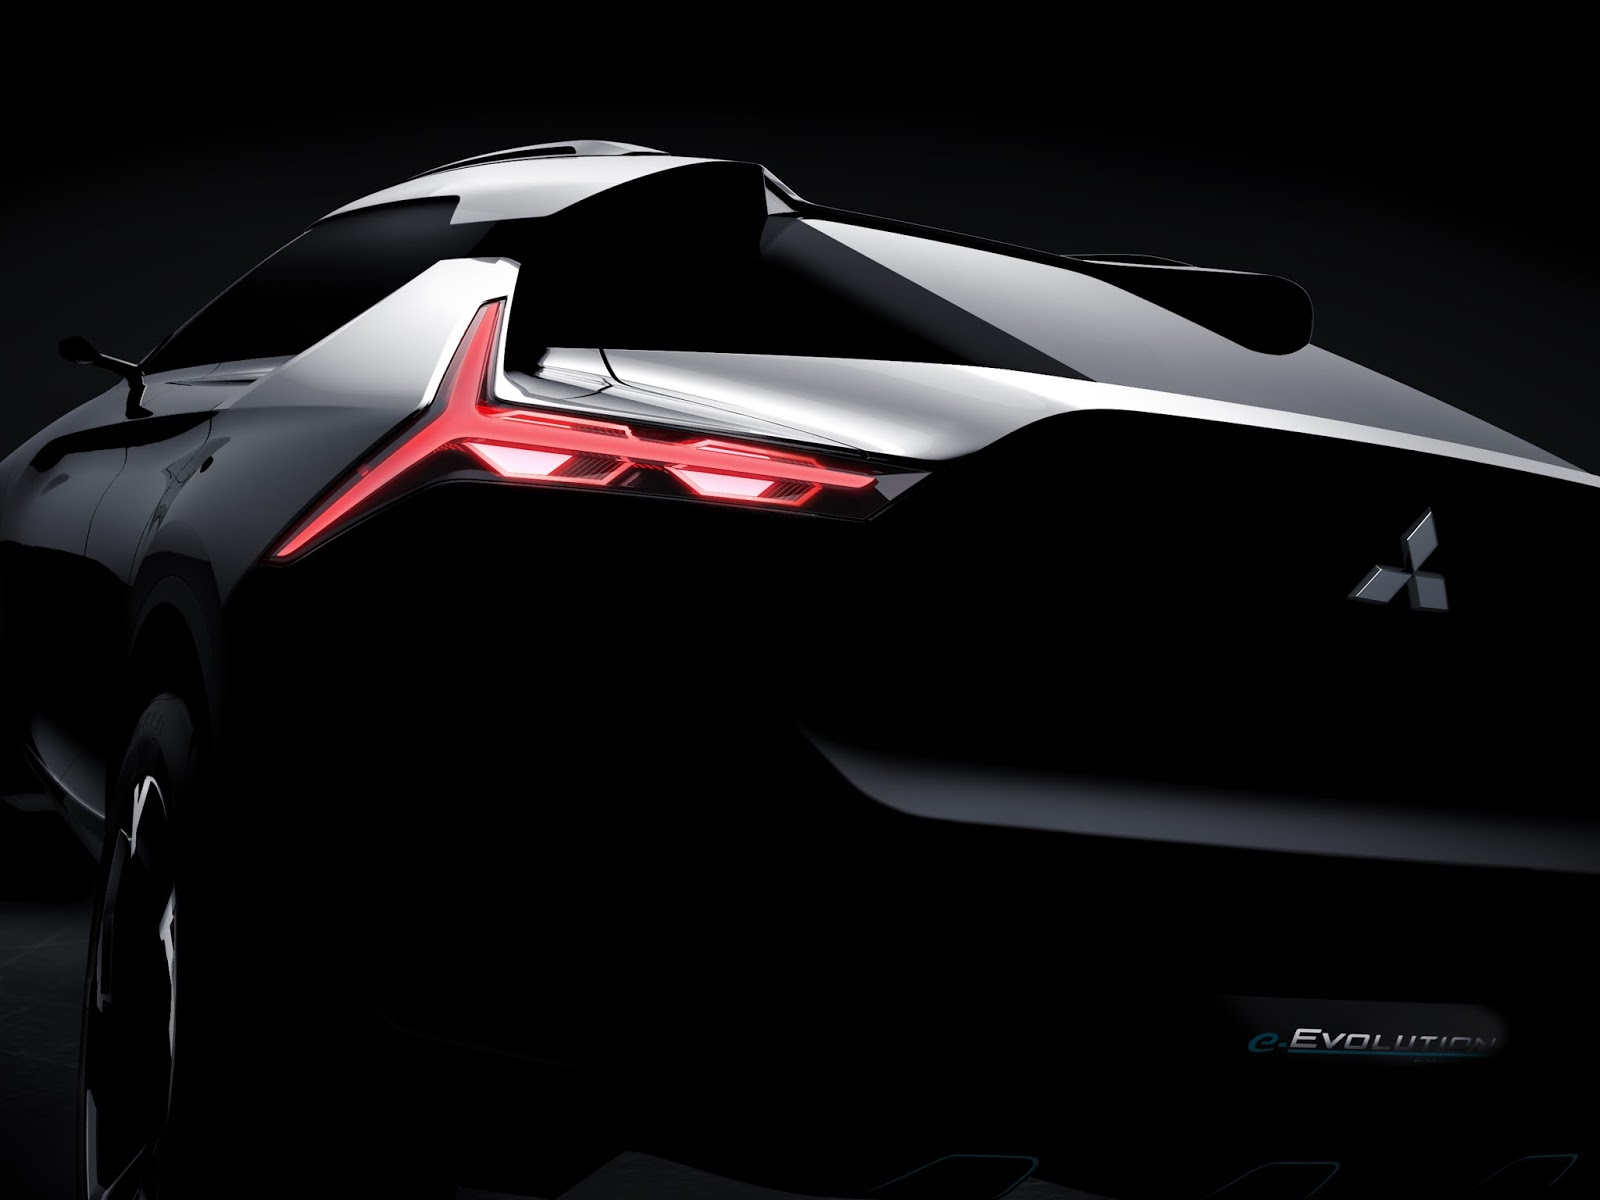 concept img 01 Πώς λειτουργεί η τετρακίνηση του e-EVOLUTION Mitsubishi, Mitsubishi Evo